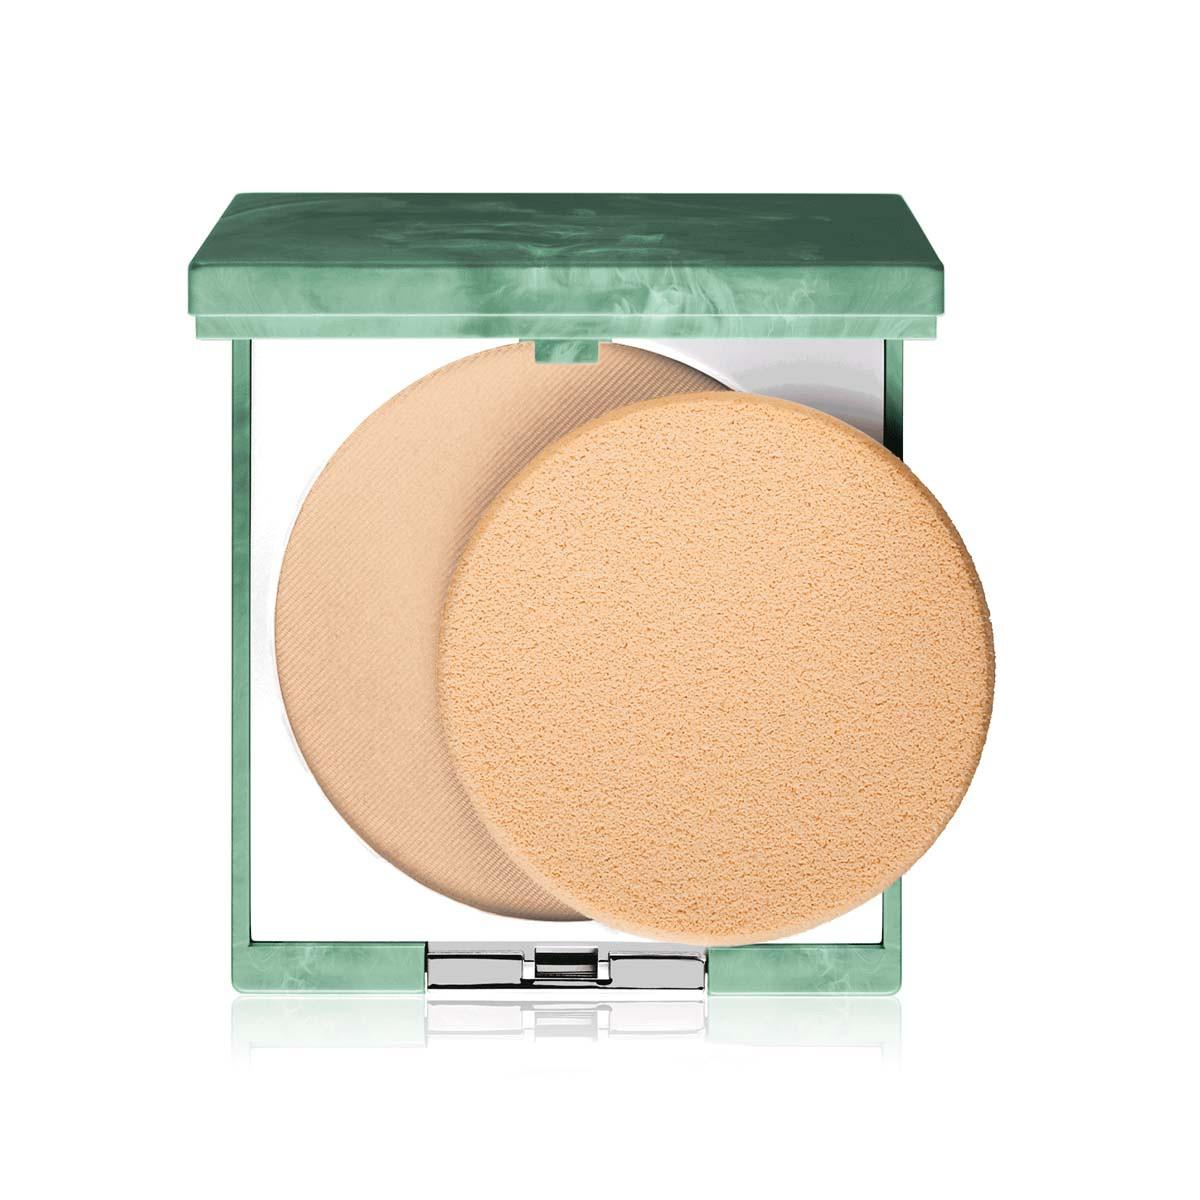 Clinique superpowder - 02 matte beige, 02 MATTE BEIGE, large image number 0